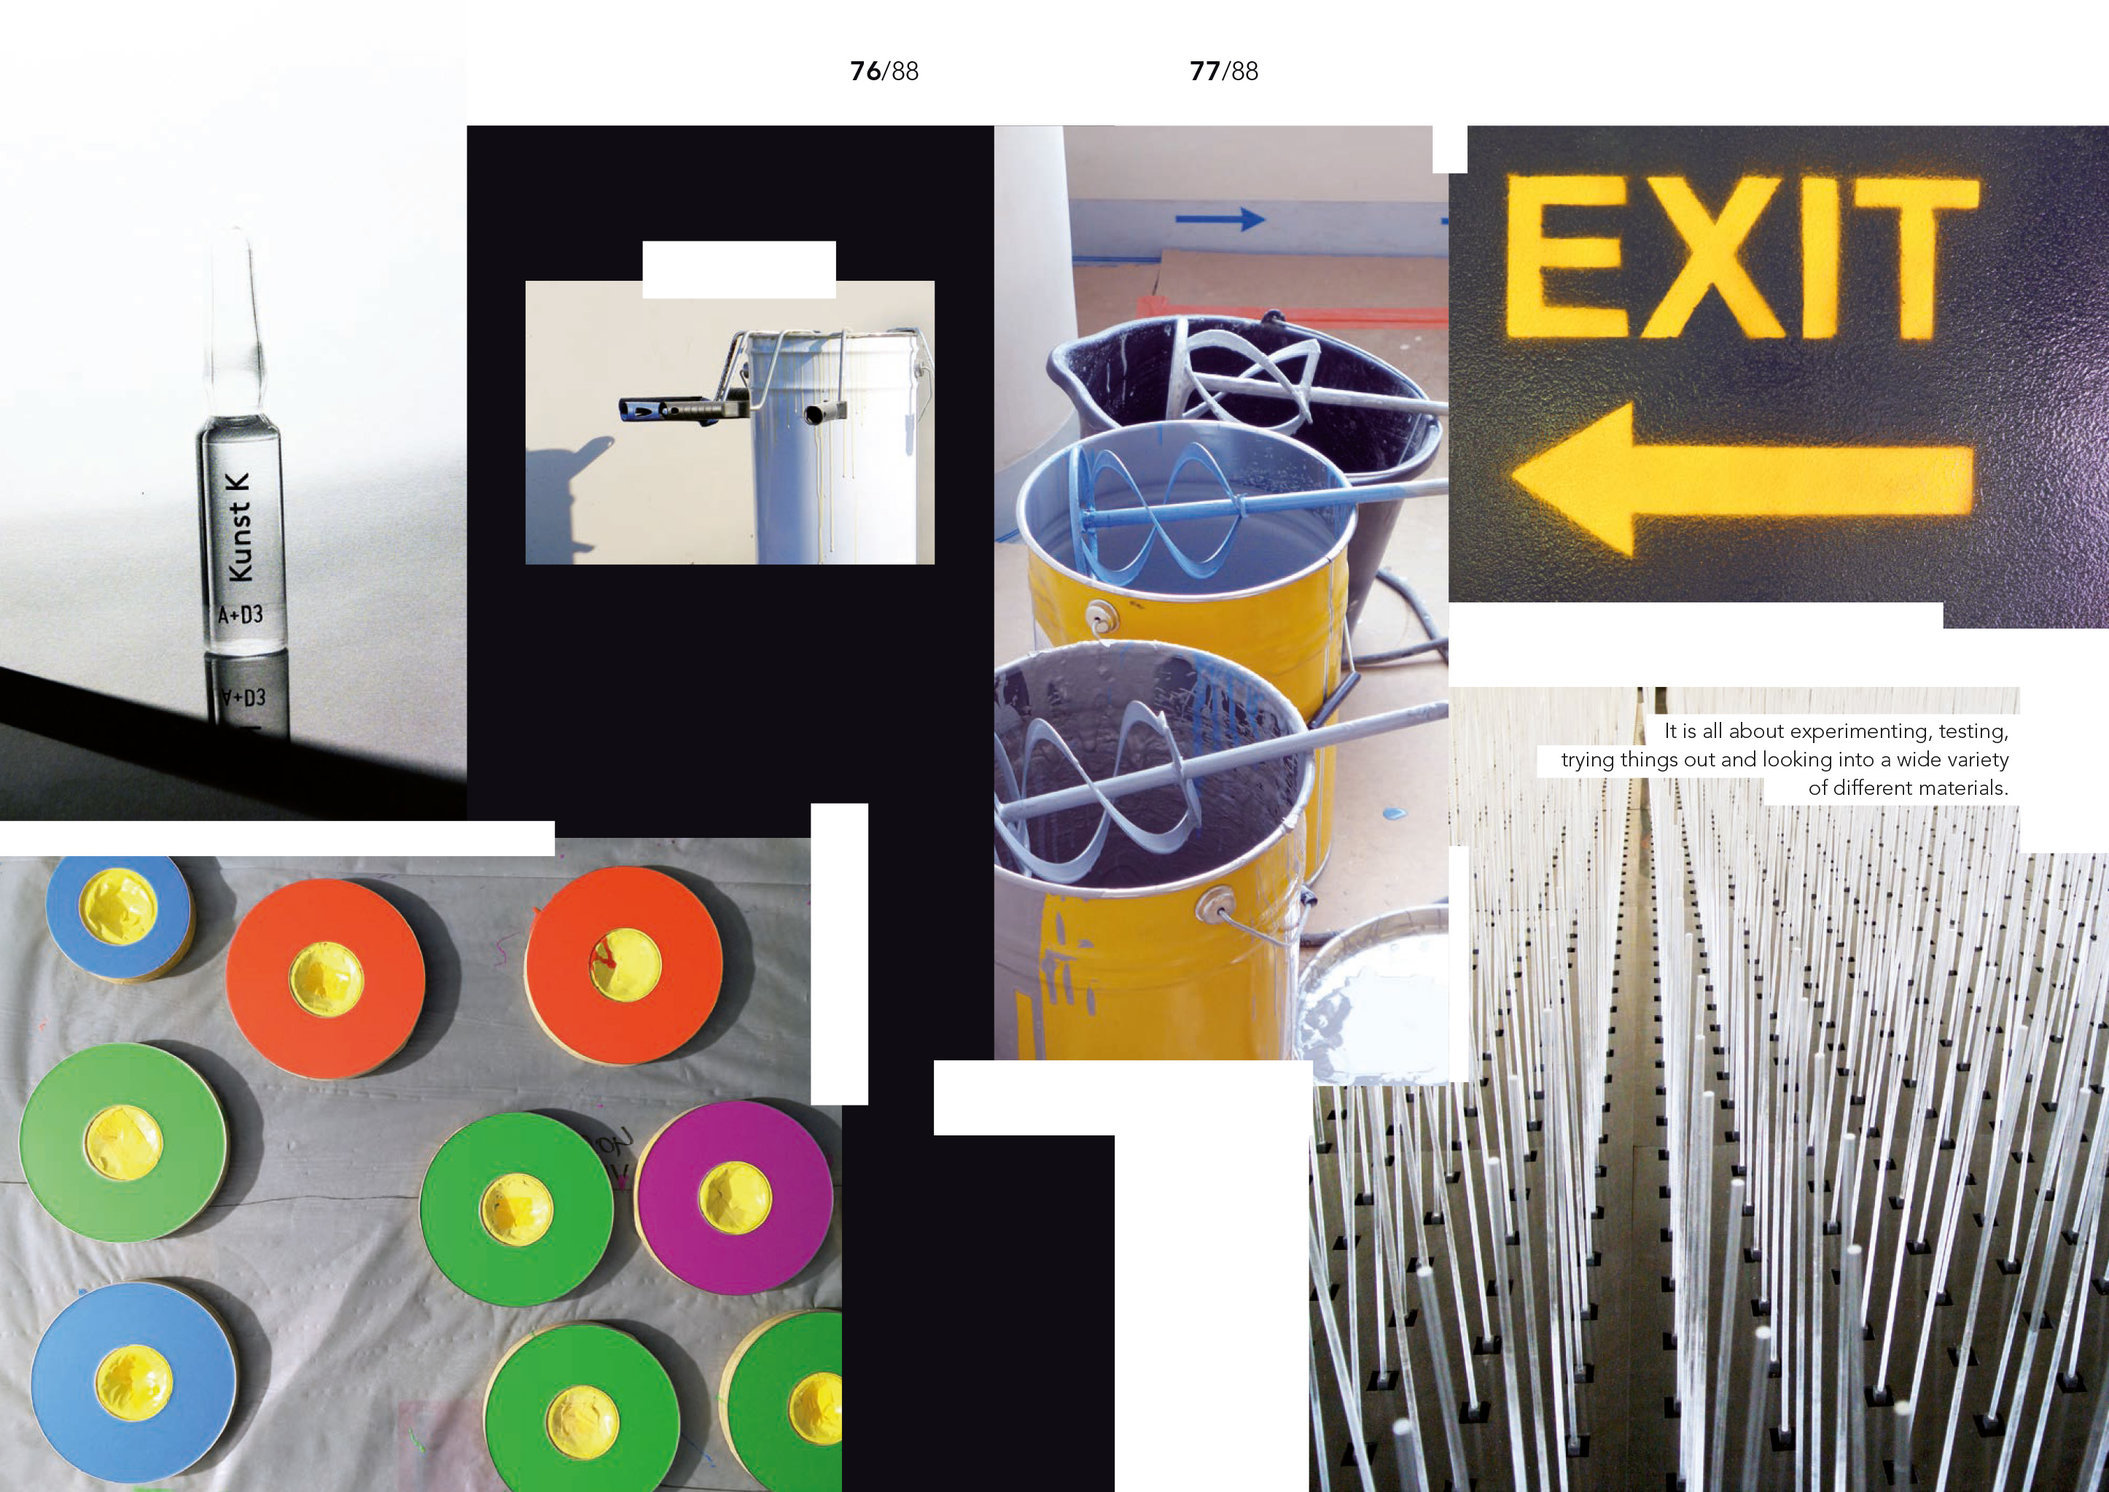 broschüre_floor systems 38.jpg